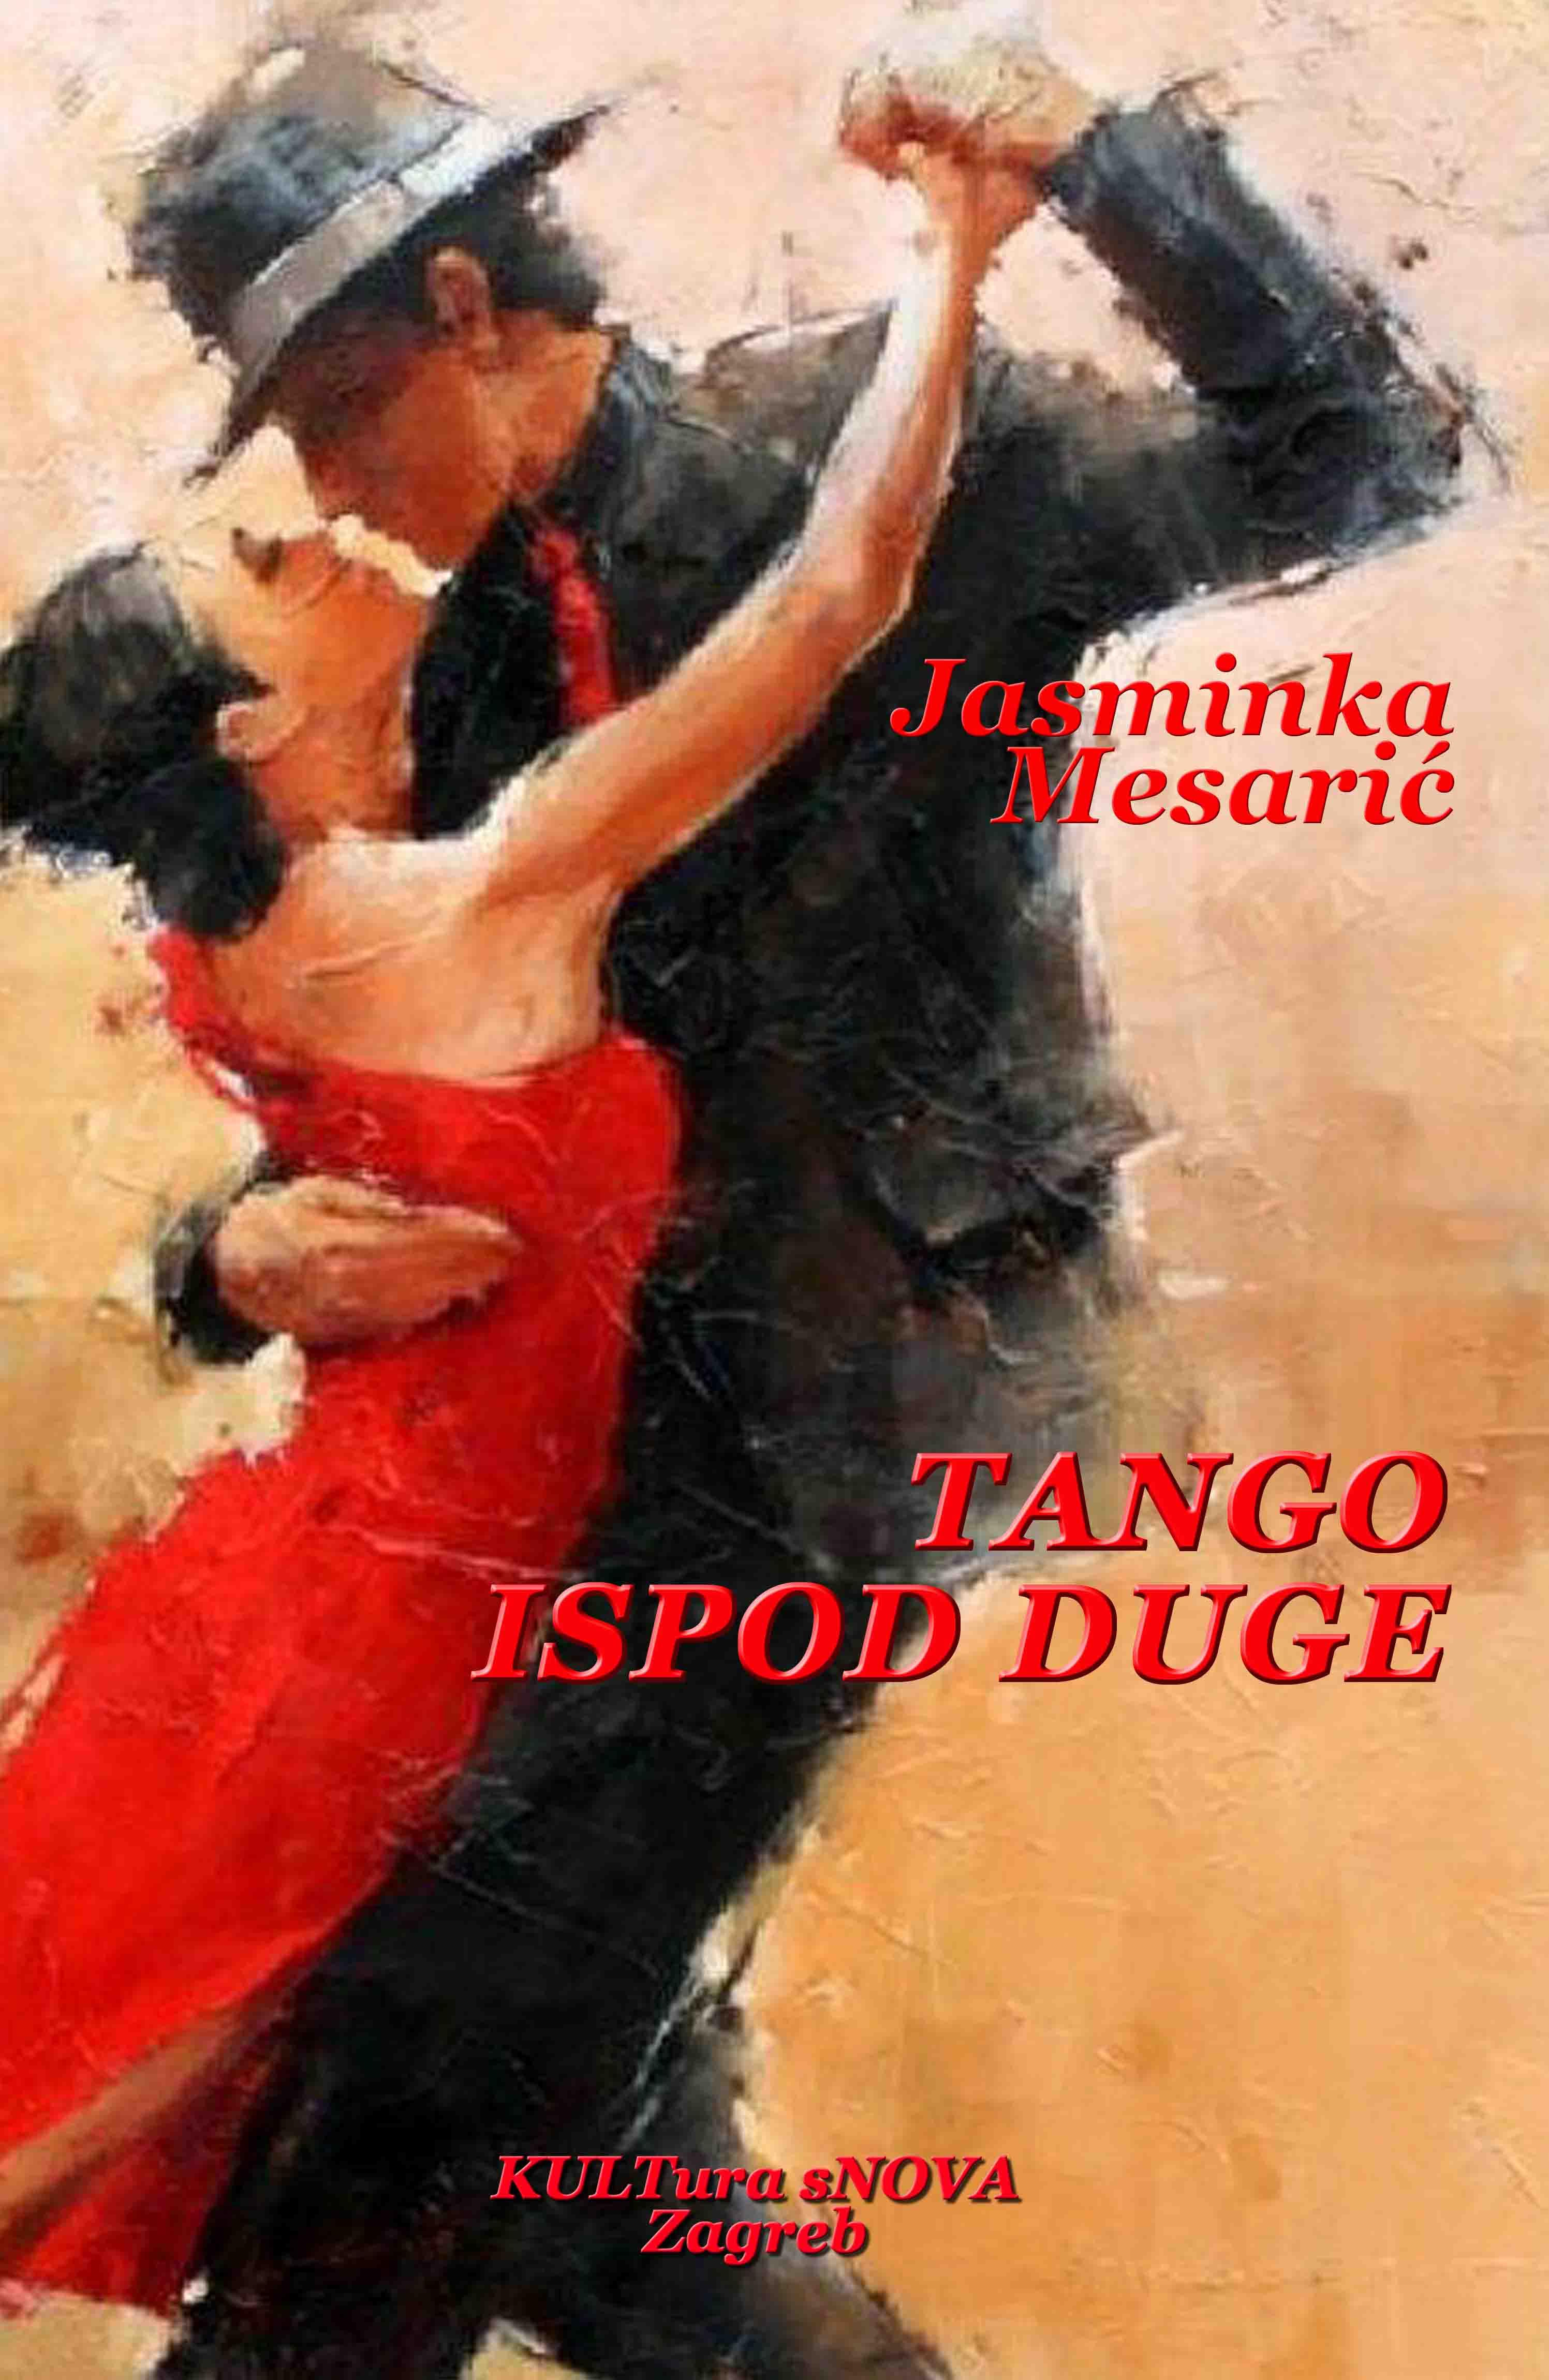 TANGO ISPOD DUGE FB.jpg